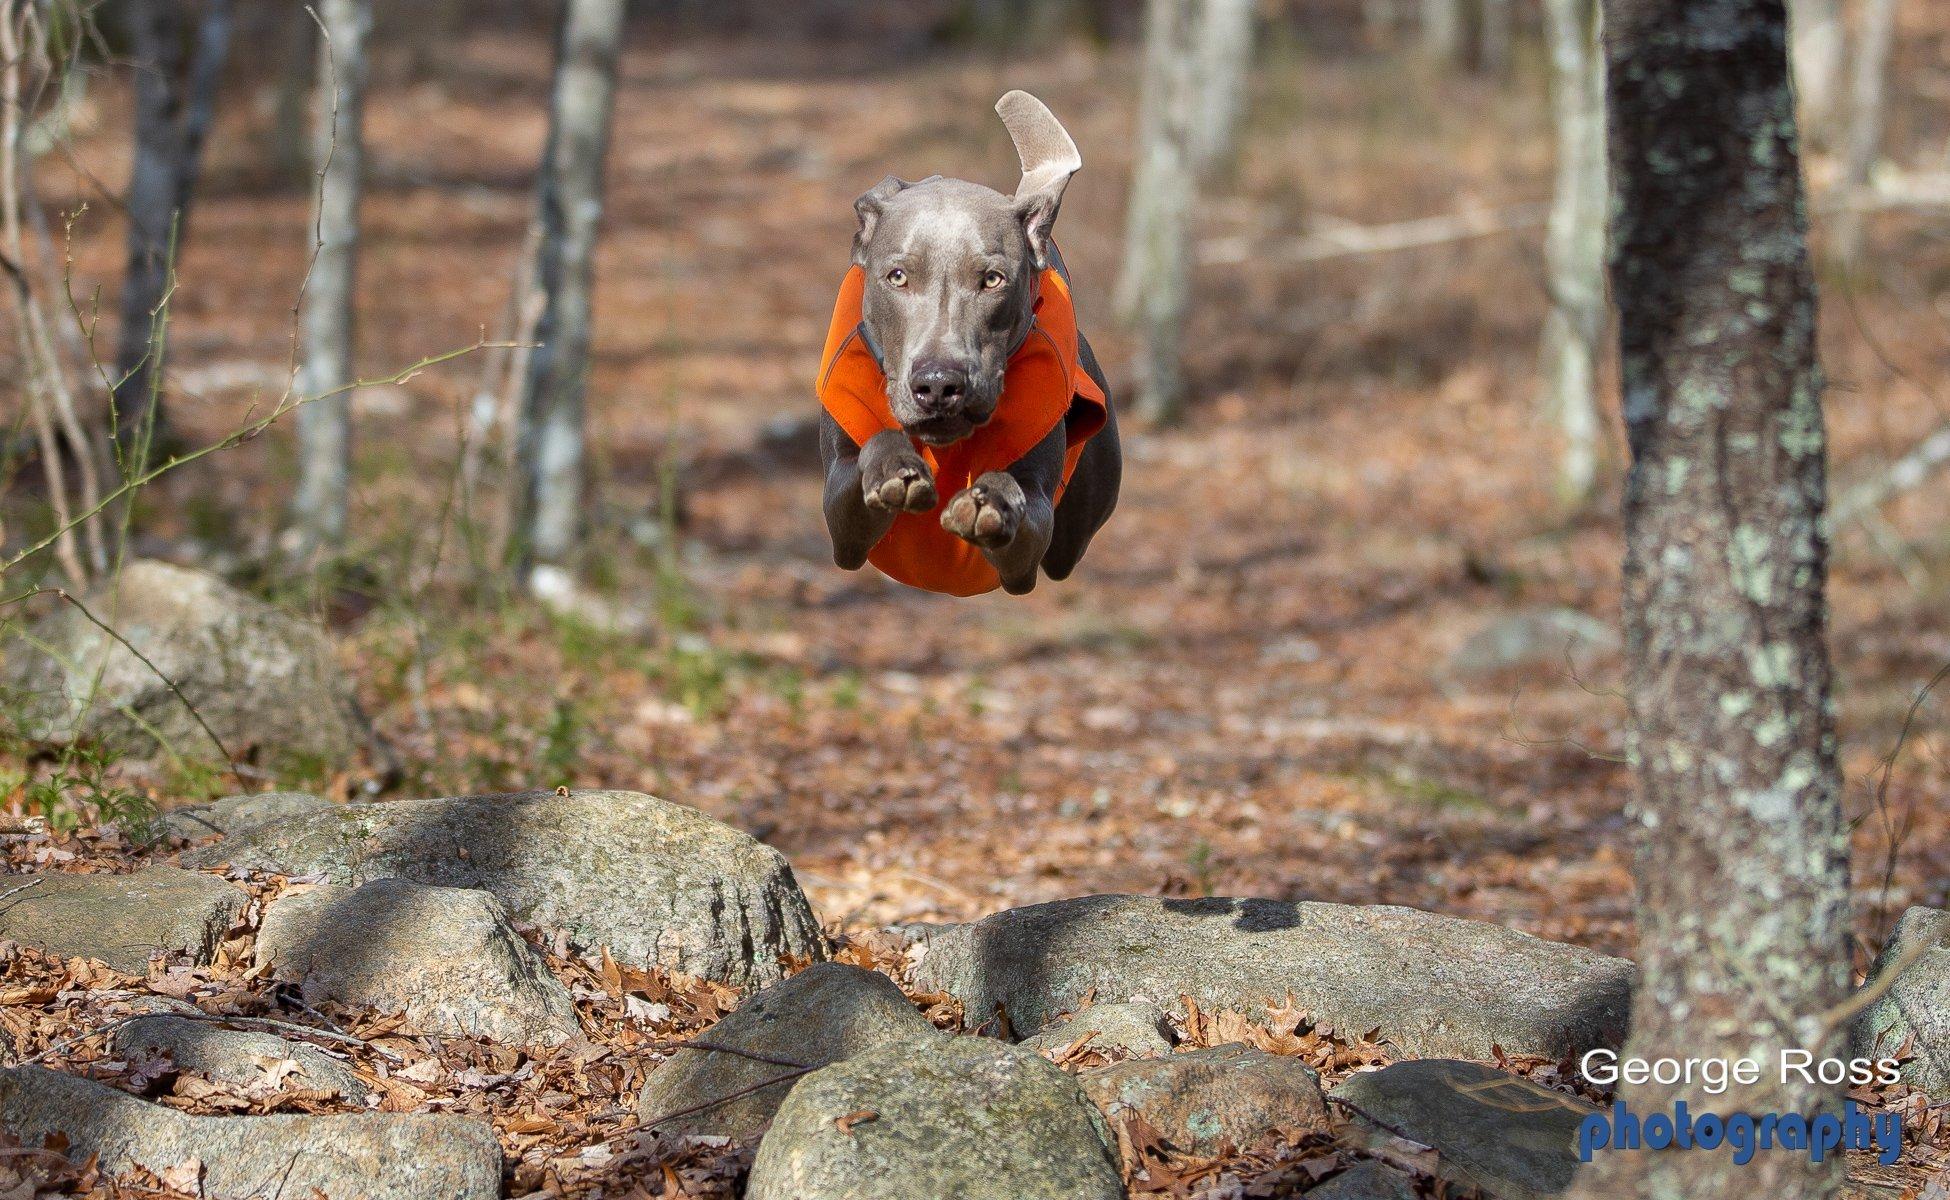 Dog Photography: Weimaraner, The Grey Ghost!